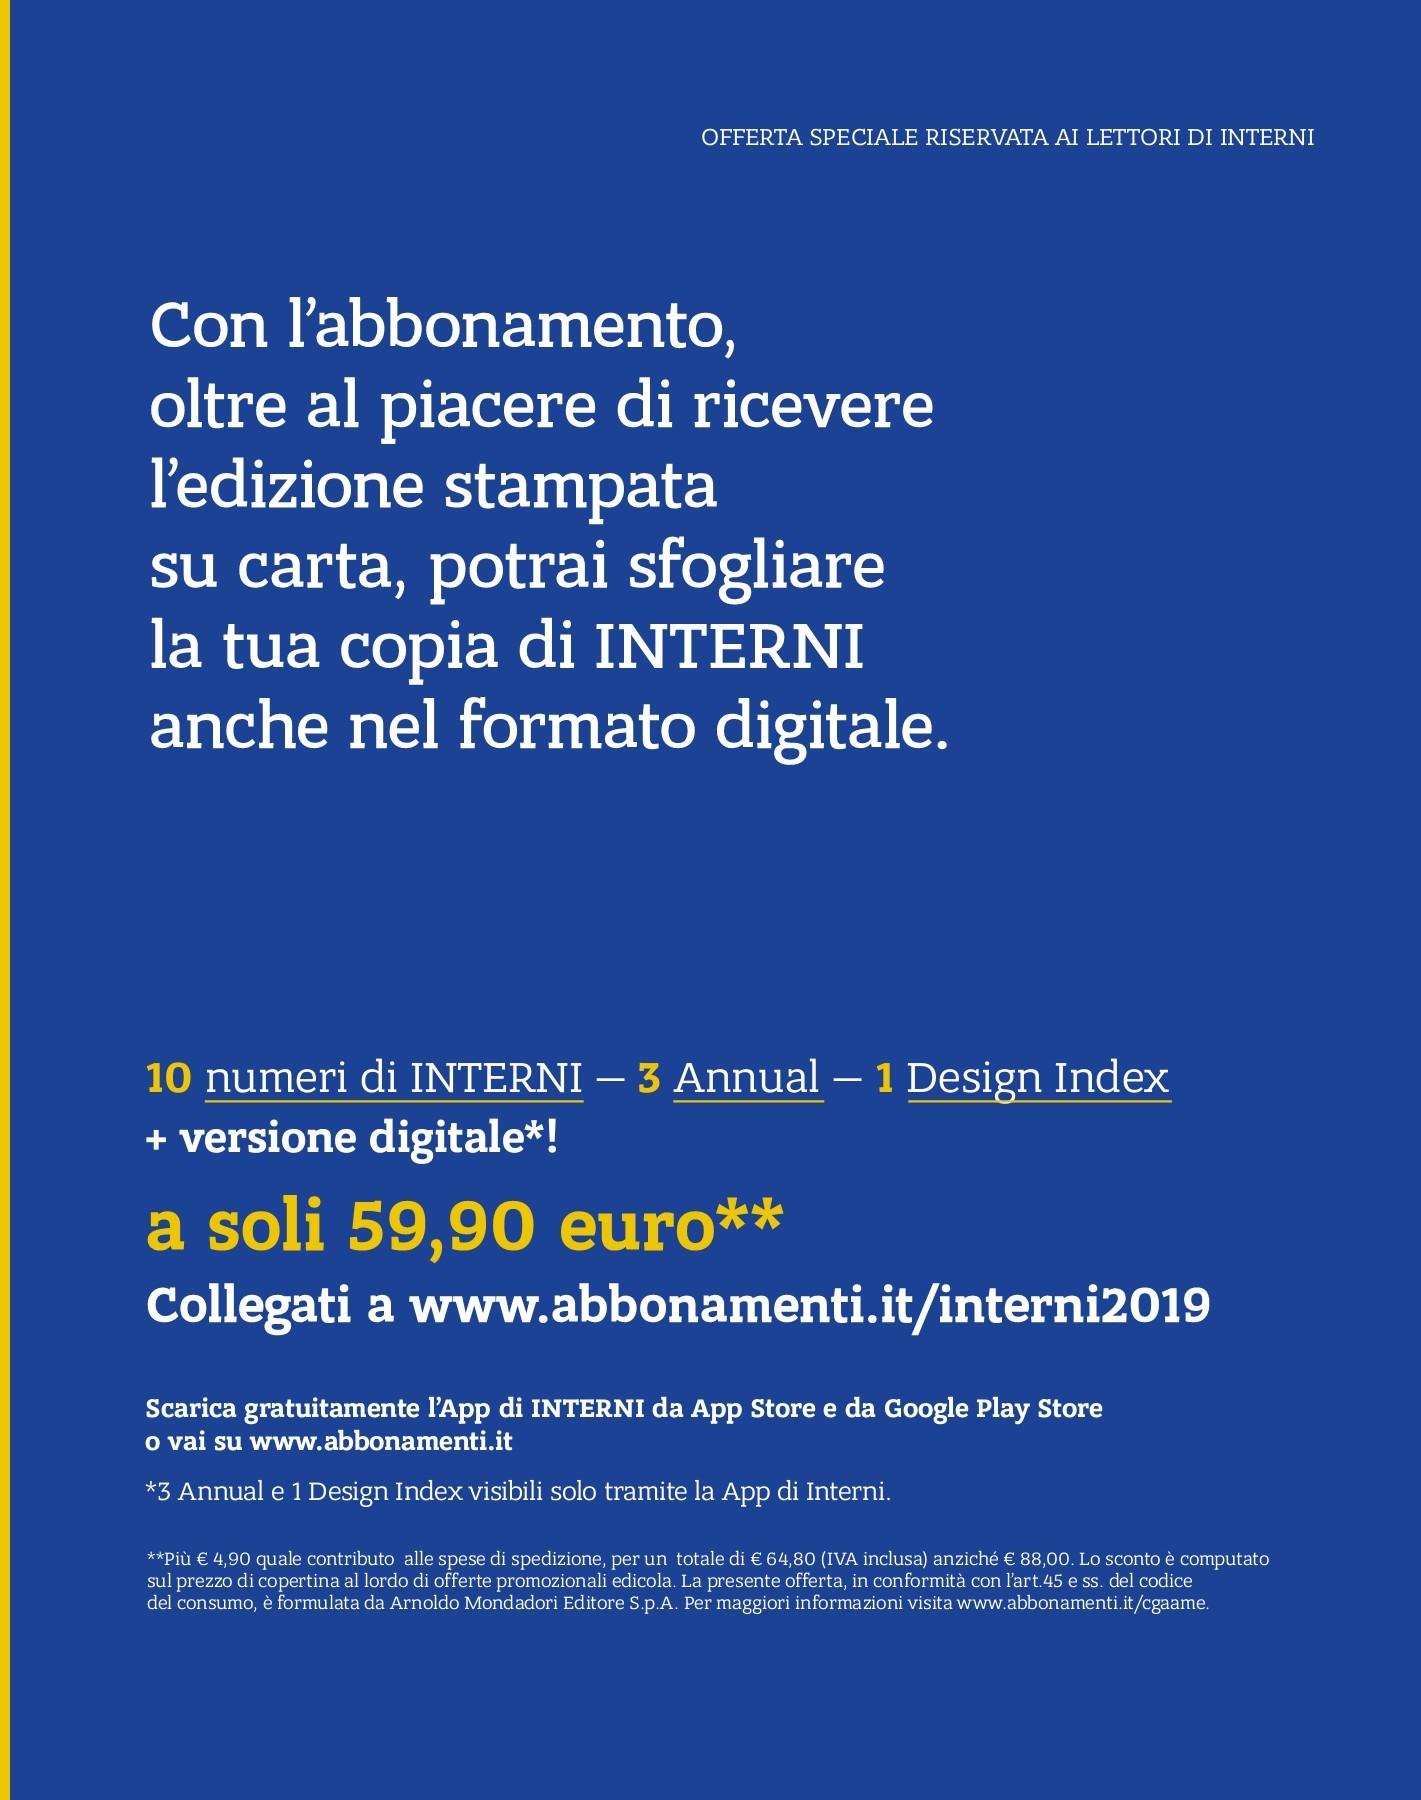 Studio Parisi E Associati Milano interni_italia_-_marzo_2019-flip book pages 101-150 | pubhtml5